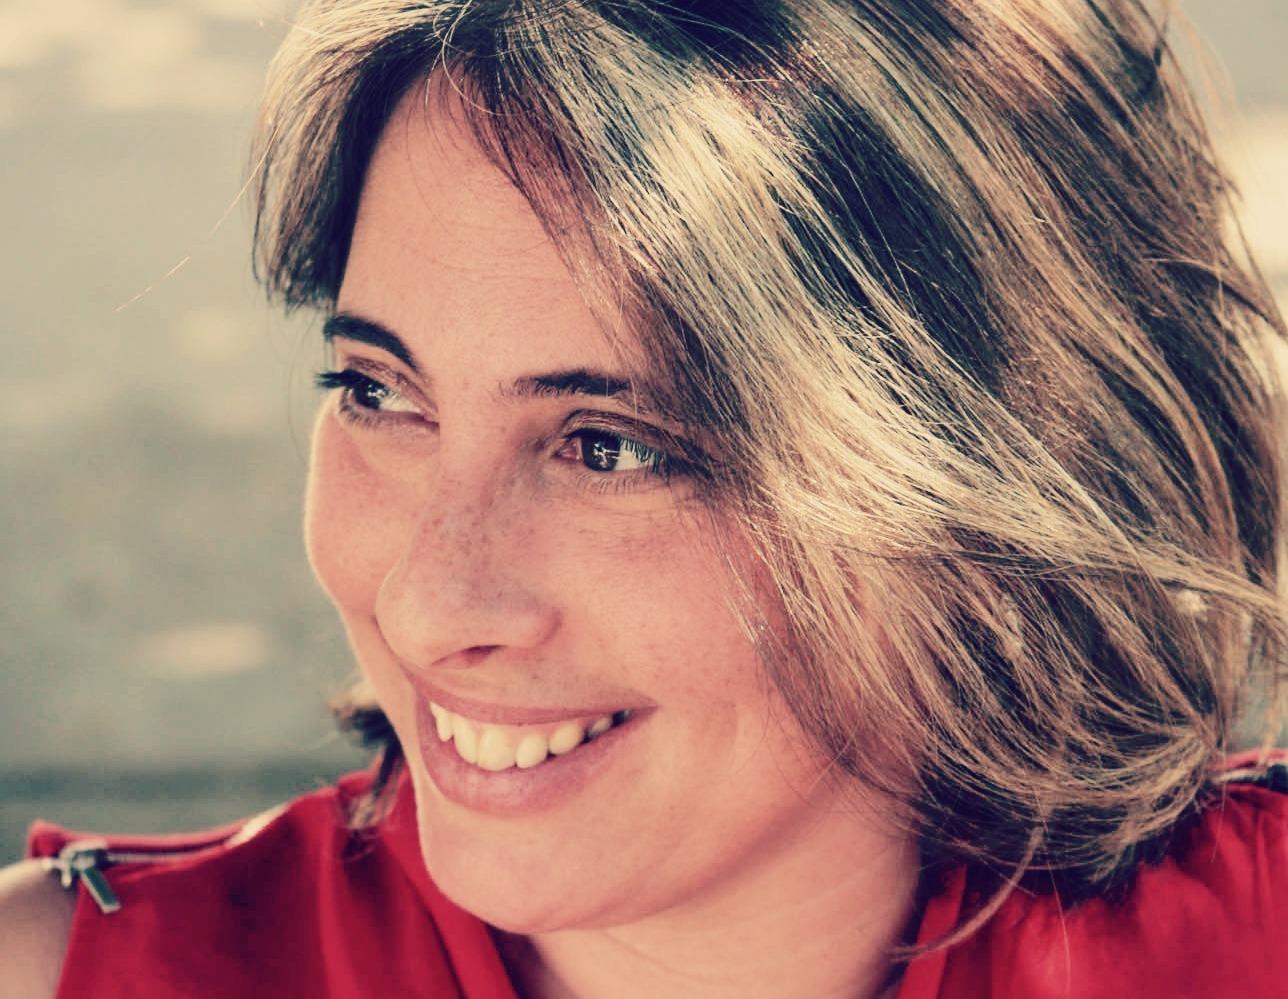 Dr. Anna Krendel, Executive Director